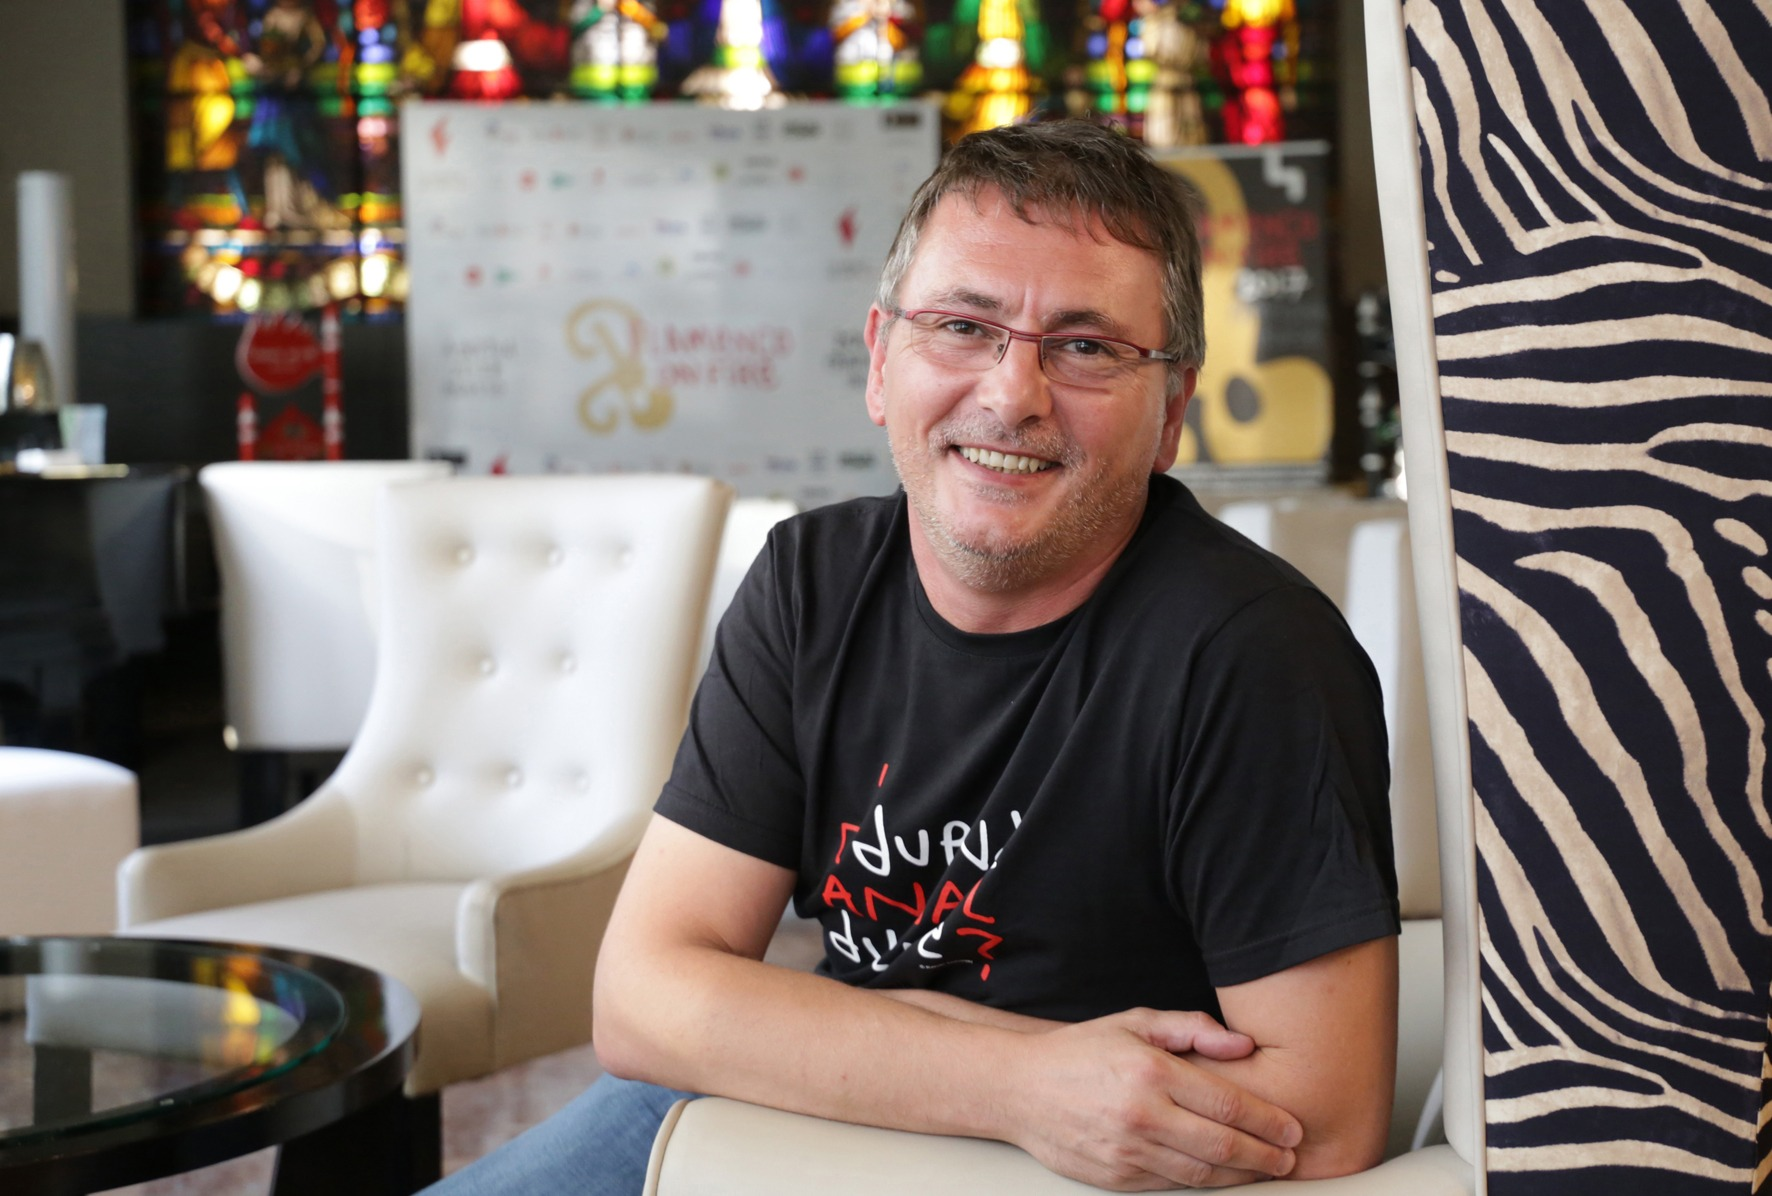 Andoni Aduriz (FOTO: PACO MANZANO)